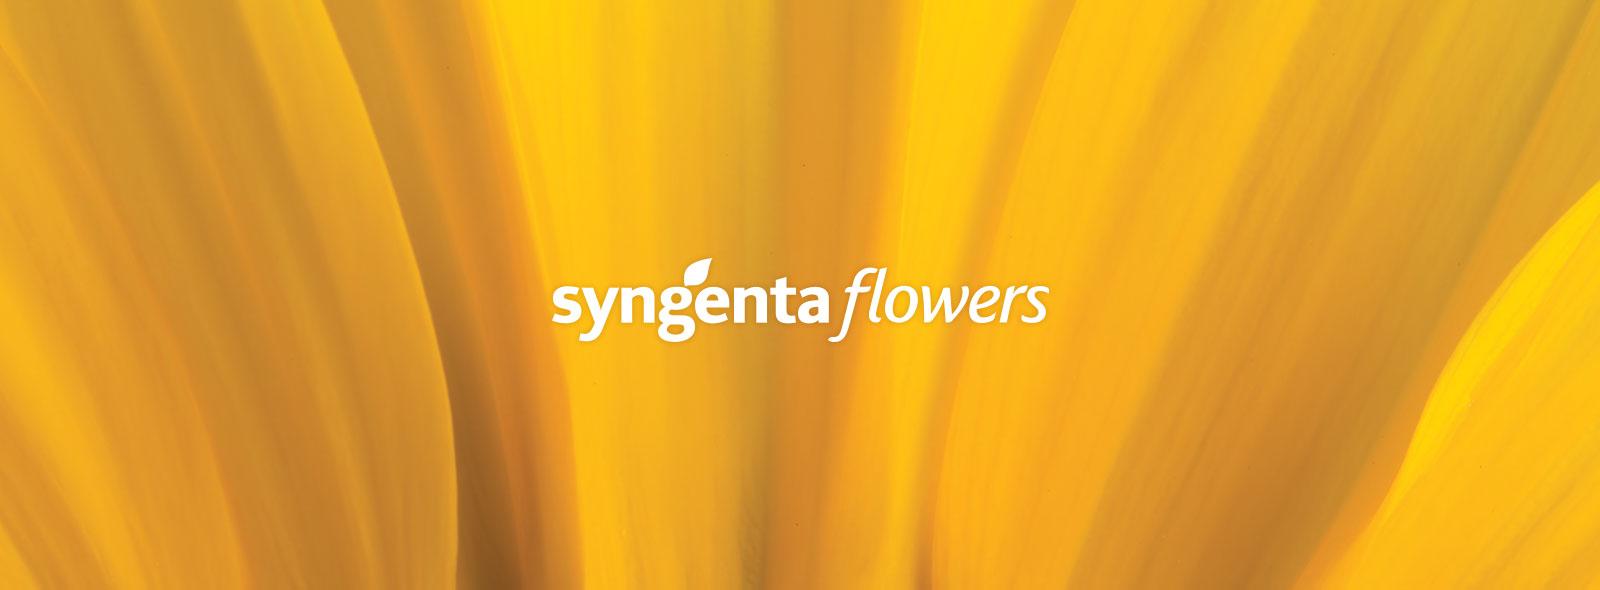 Syngenta Flowers Logo